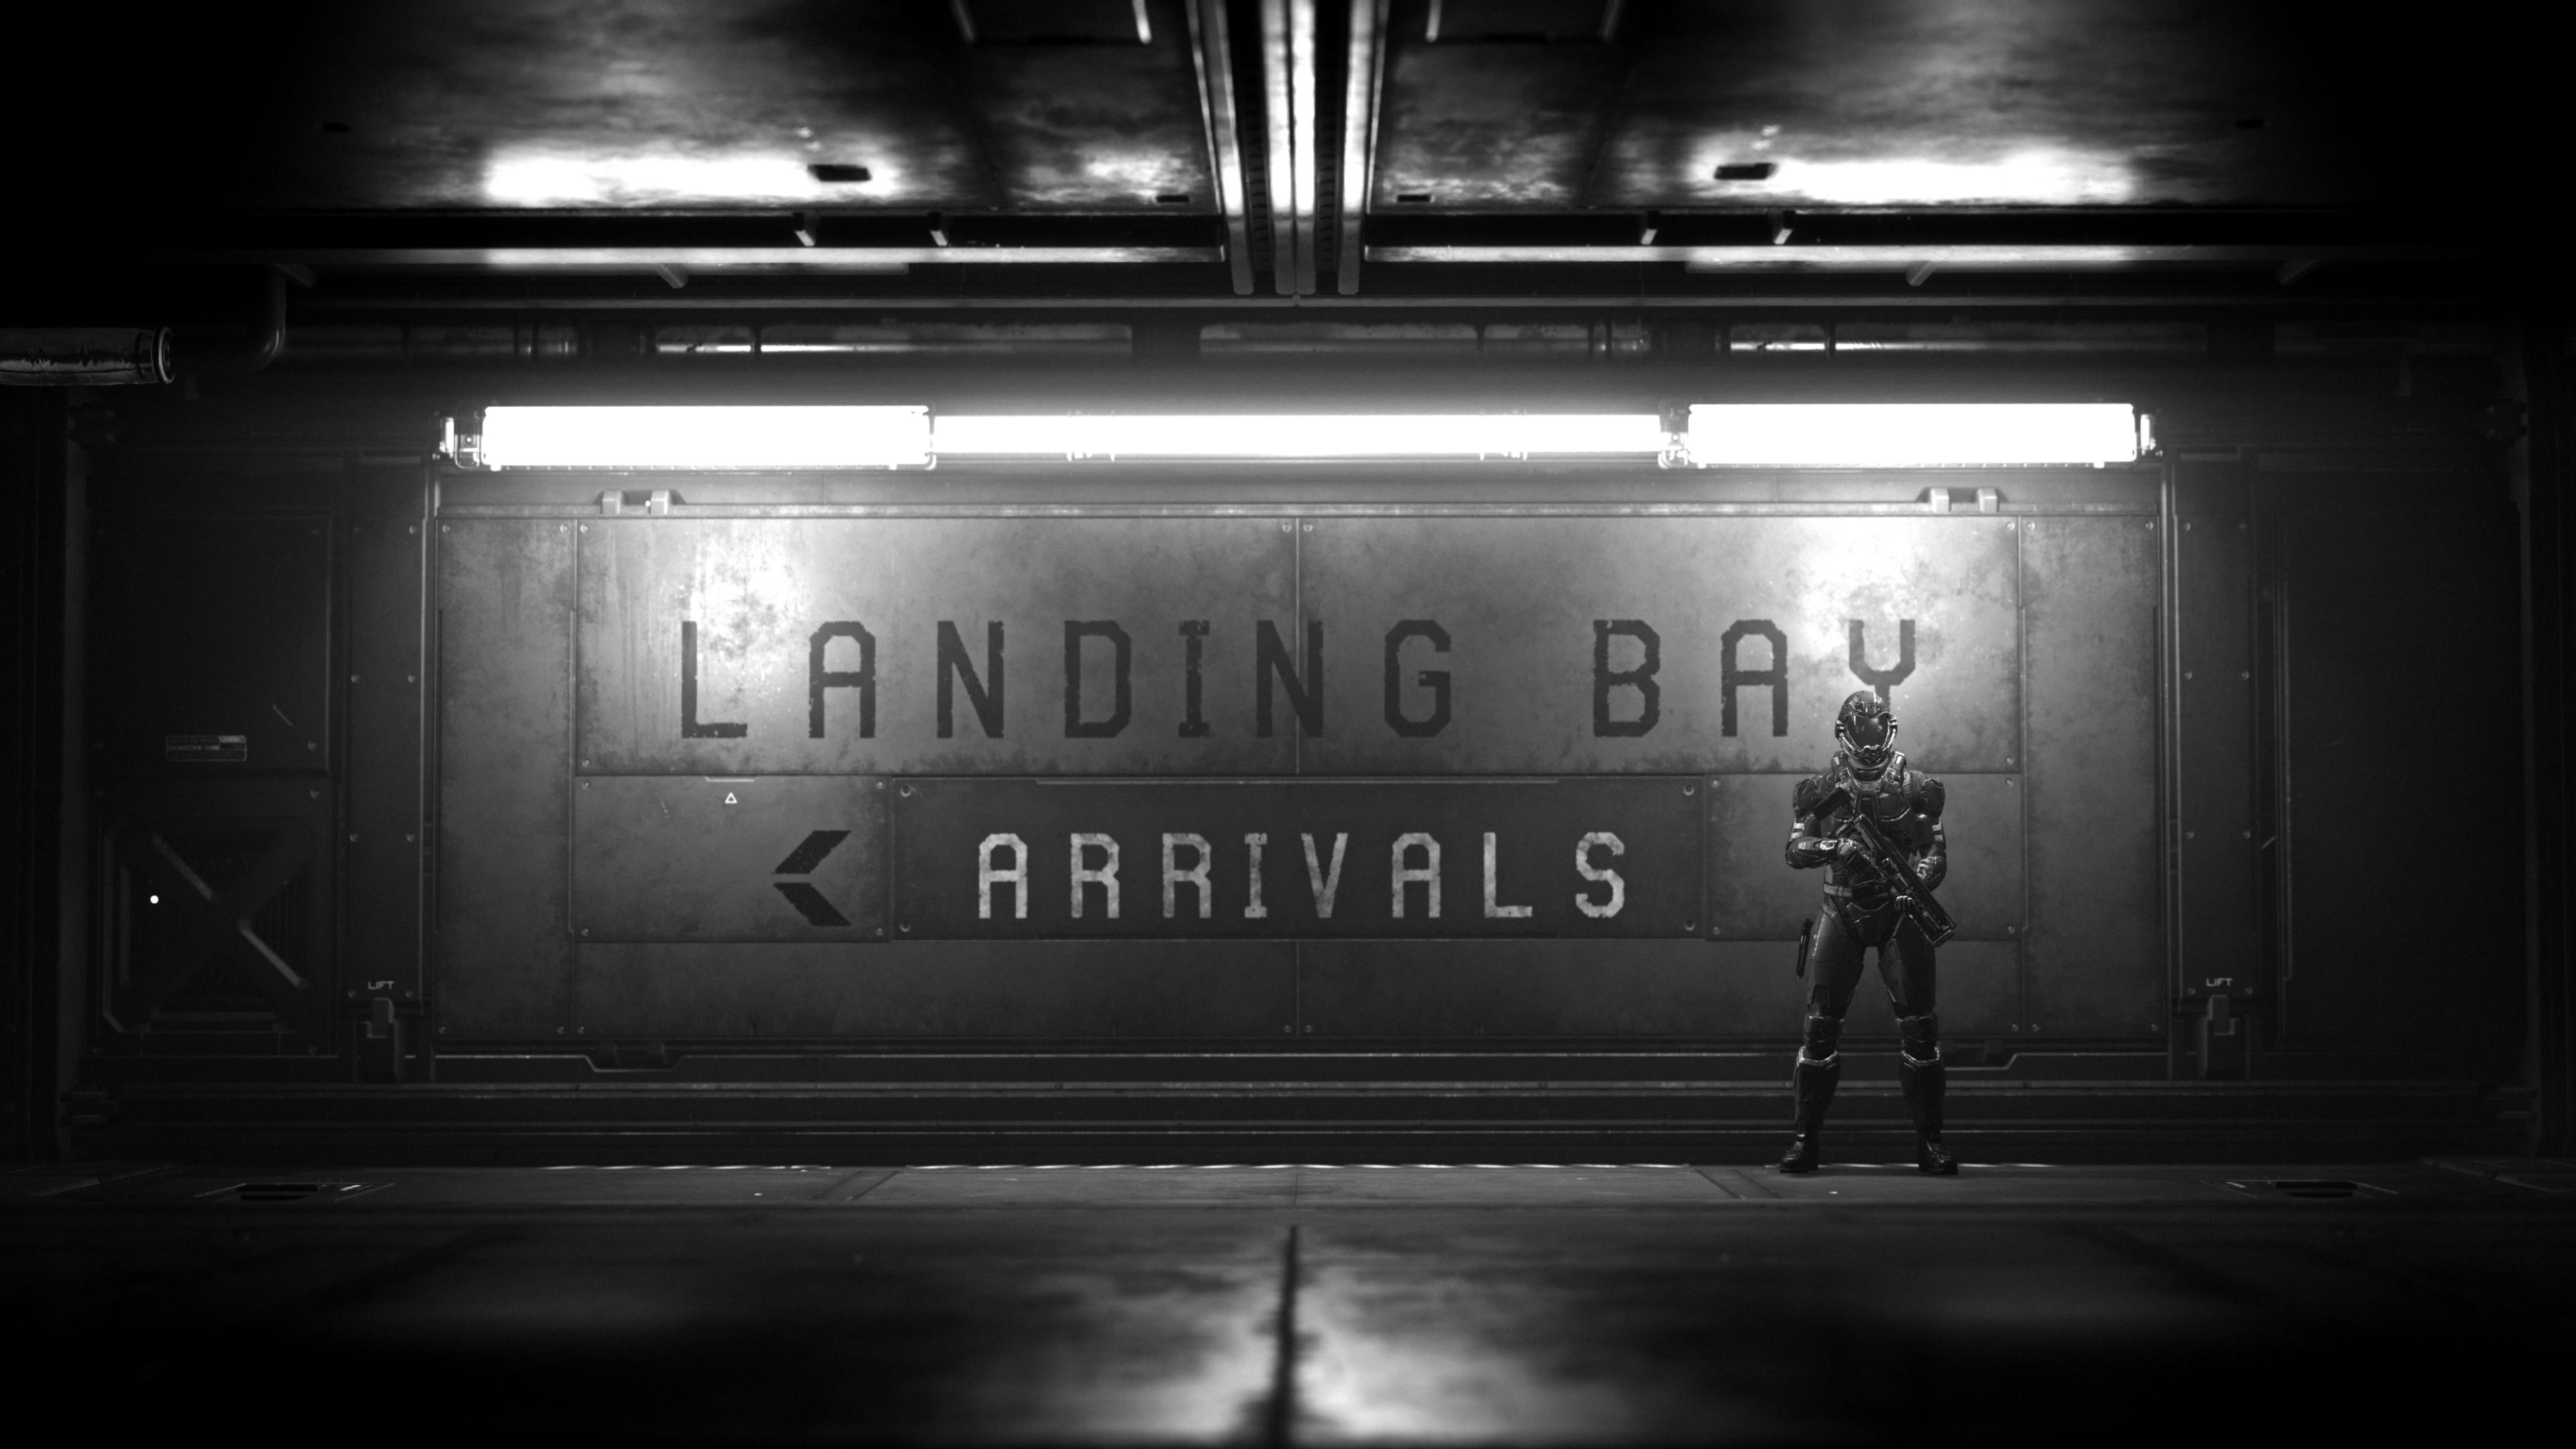 star citizen landing bay 4k 1553075098 - Star Citizen Landing Bay 4k - star citizen wallpapers, spaceship wallpapers, pc games wallpapers, hd-wallpapers, games wallpapers, 4k-wallpapers, 2019 games wallpapers